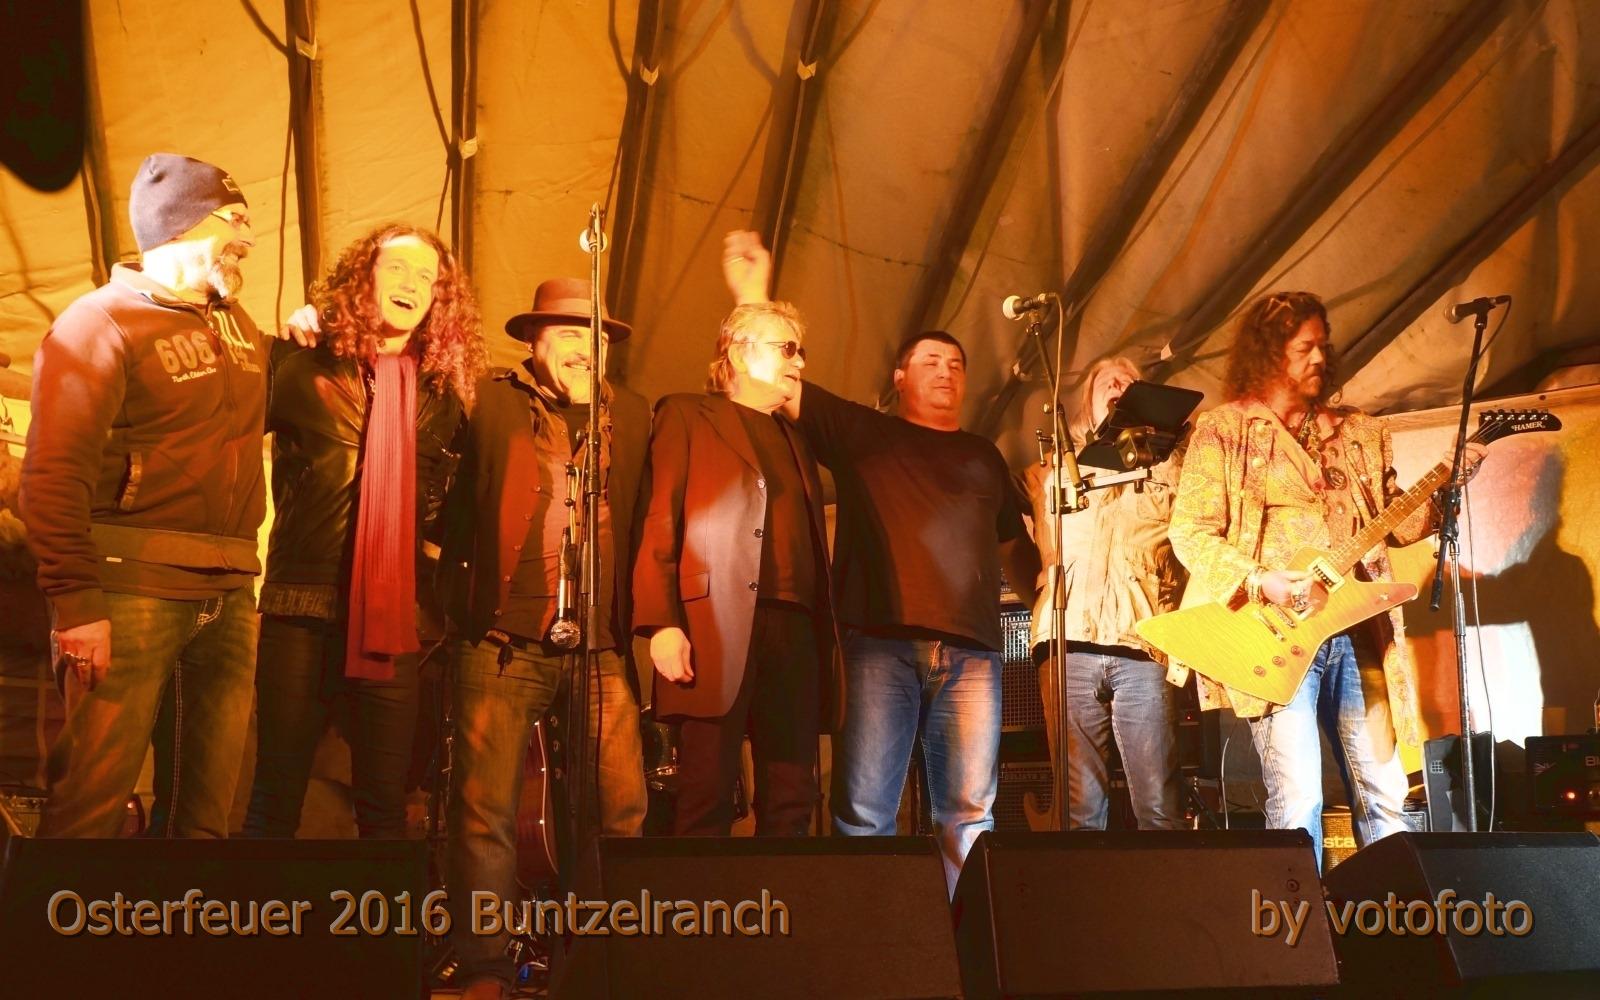 Osterfeuer 2016 Buntzelranch  163